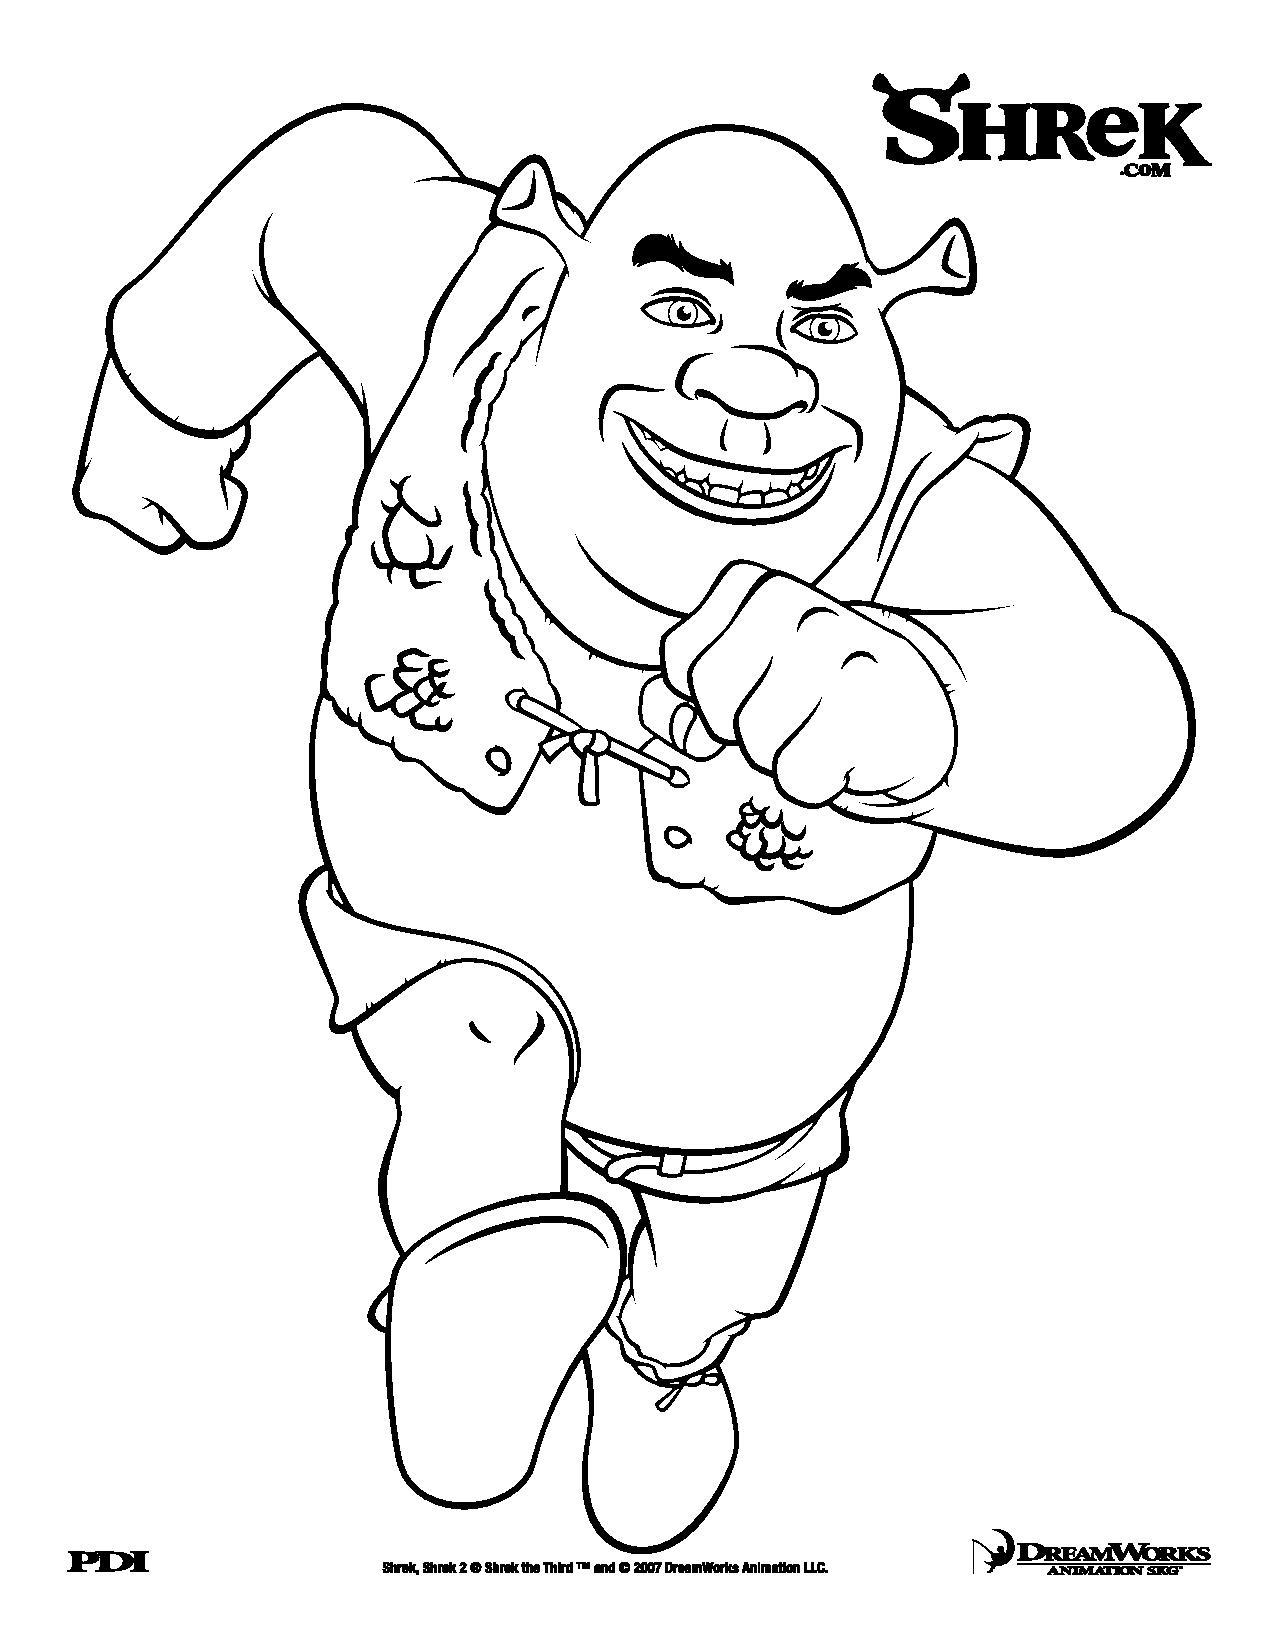 Coloriage de Shrek en train de courir